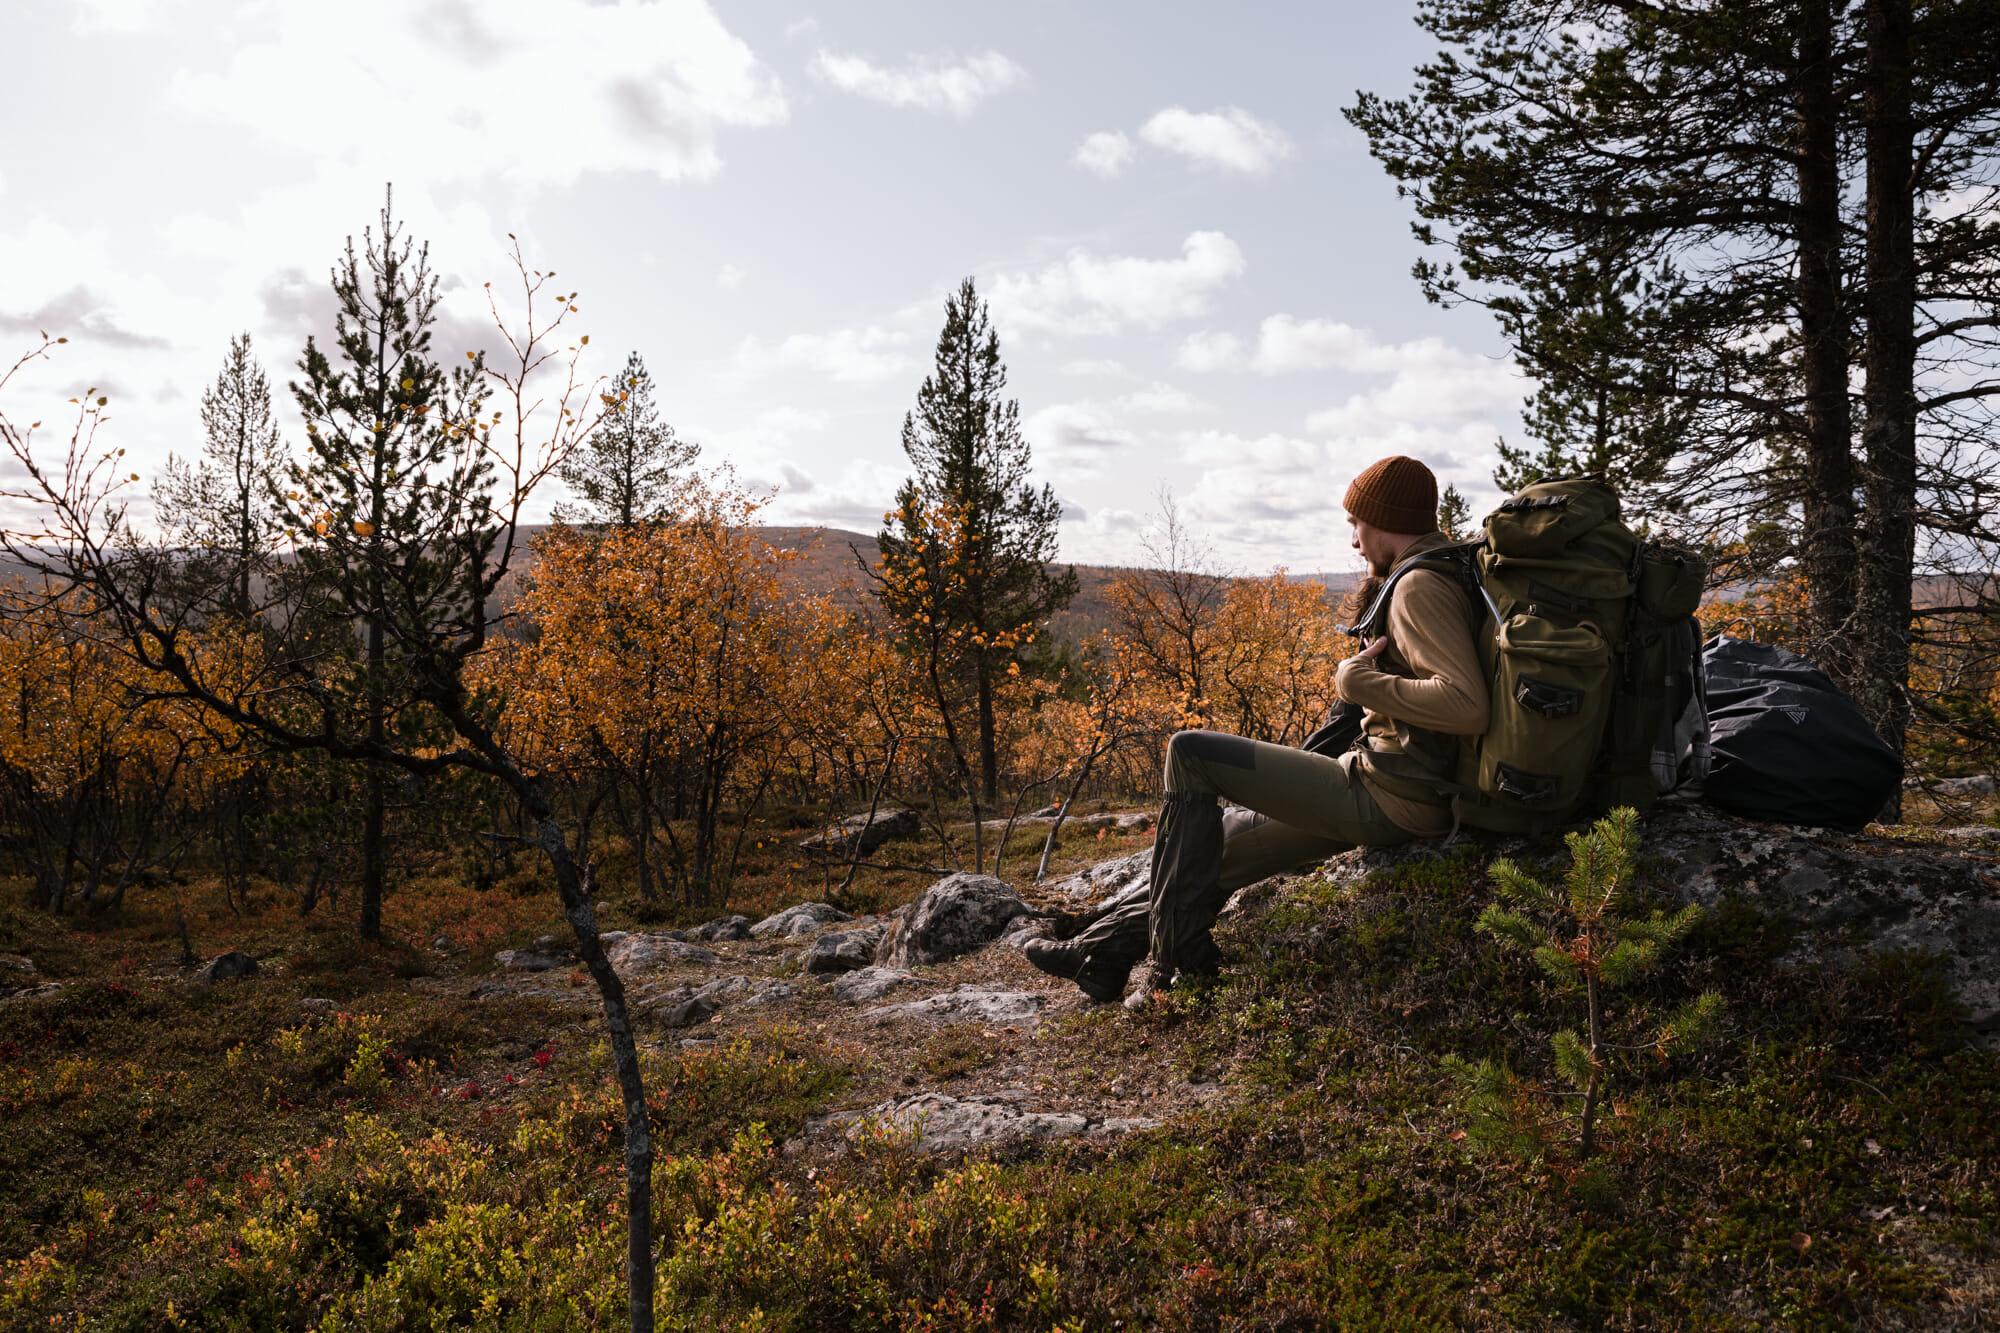 Zone sauvage d'Hammastunturi en Laponie finlandaise